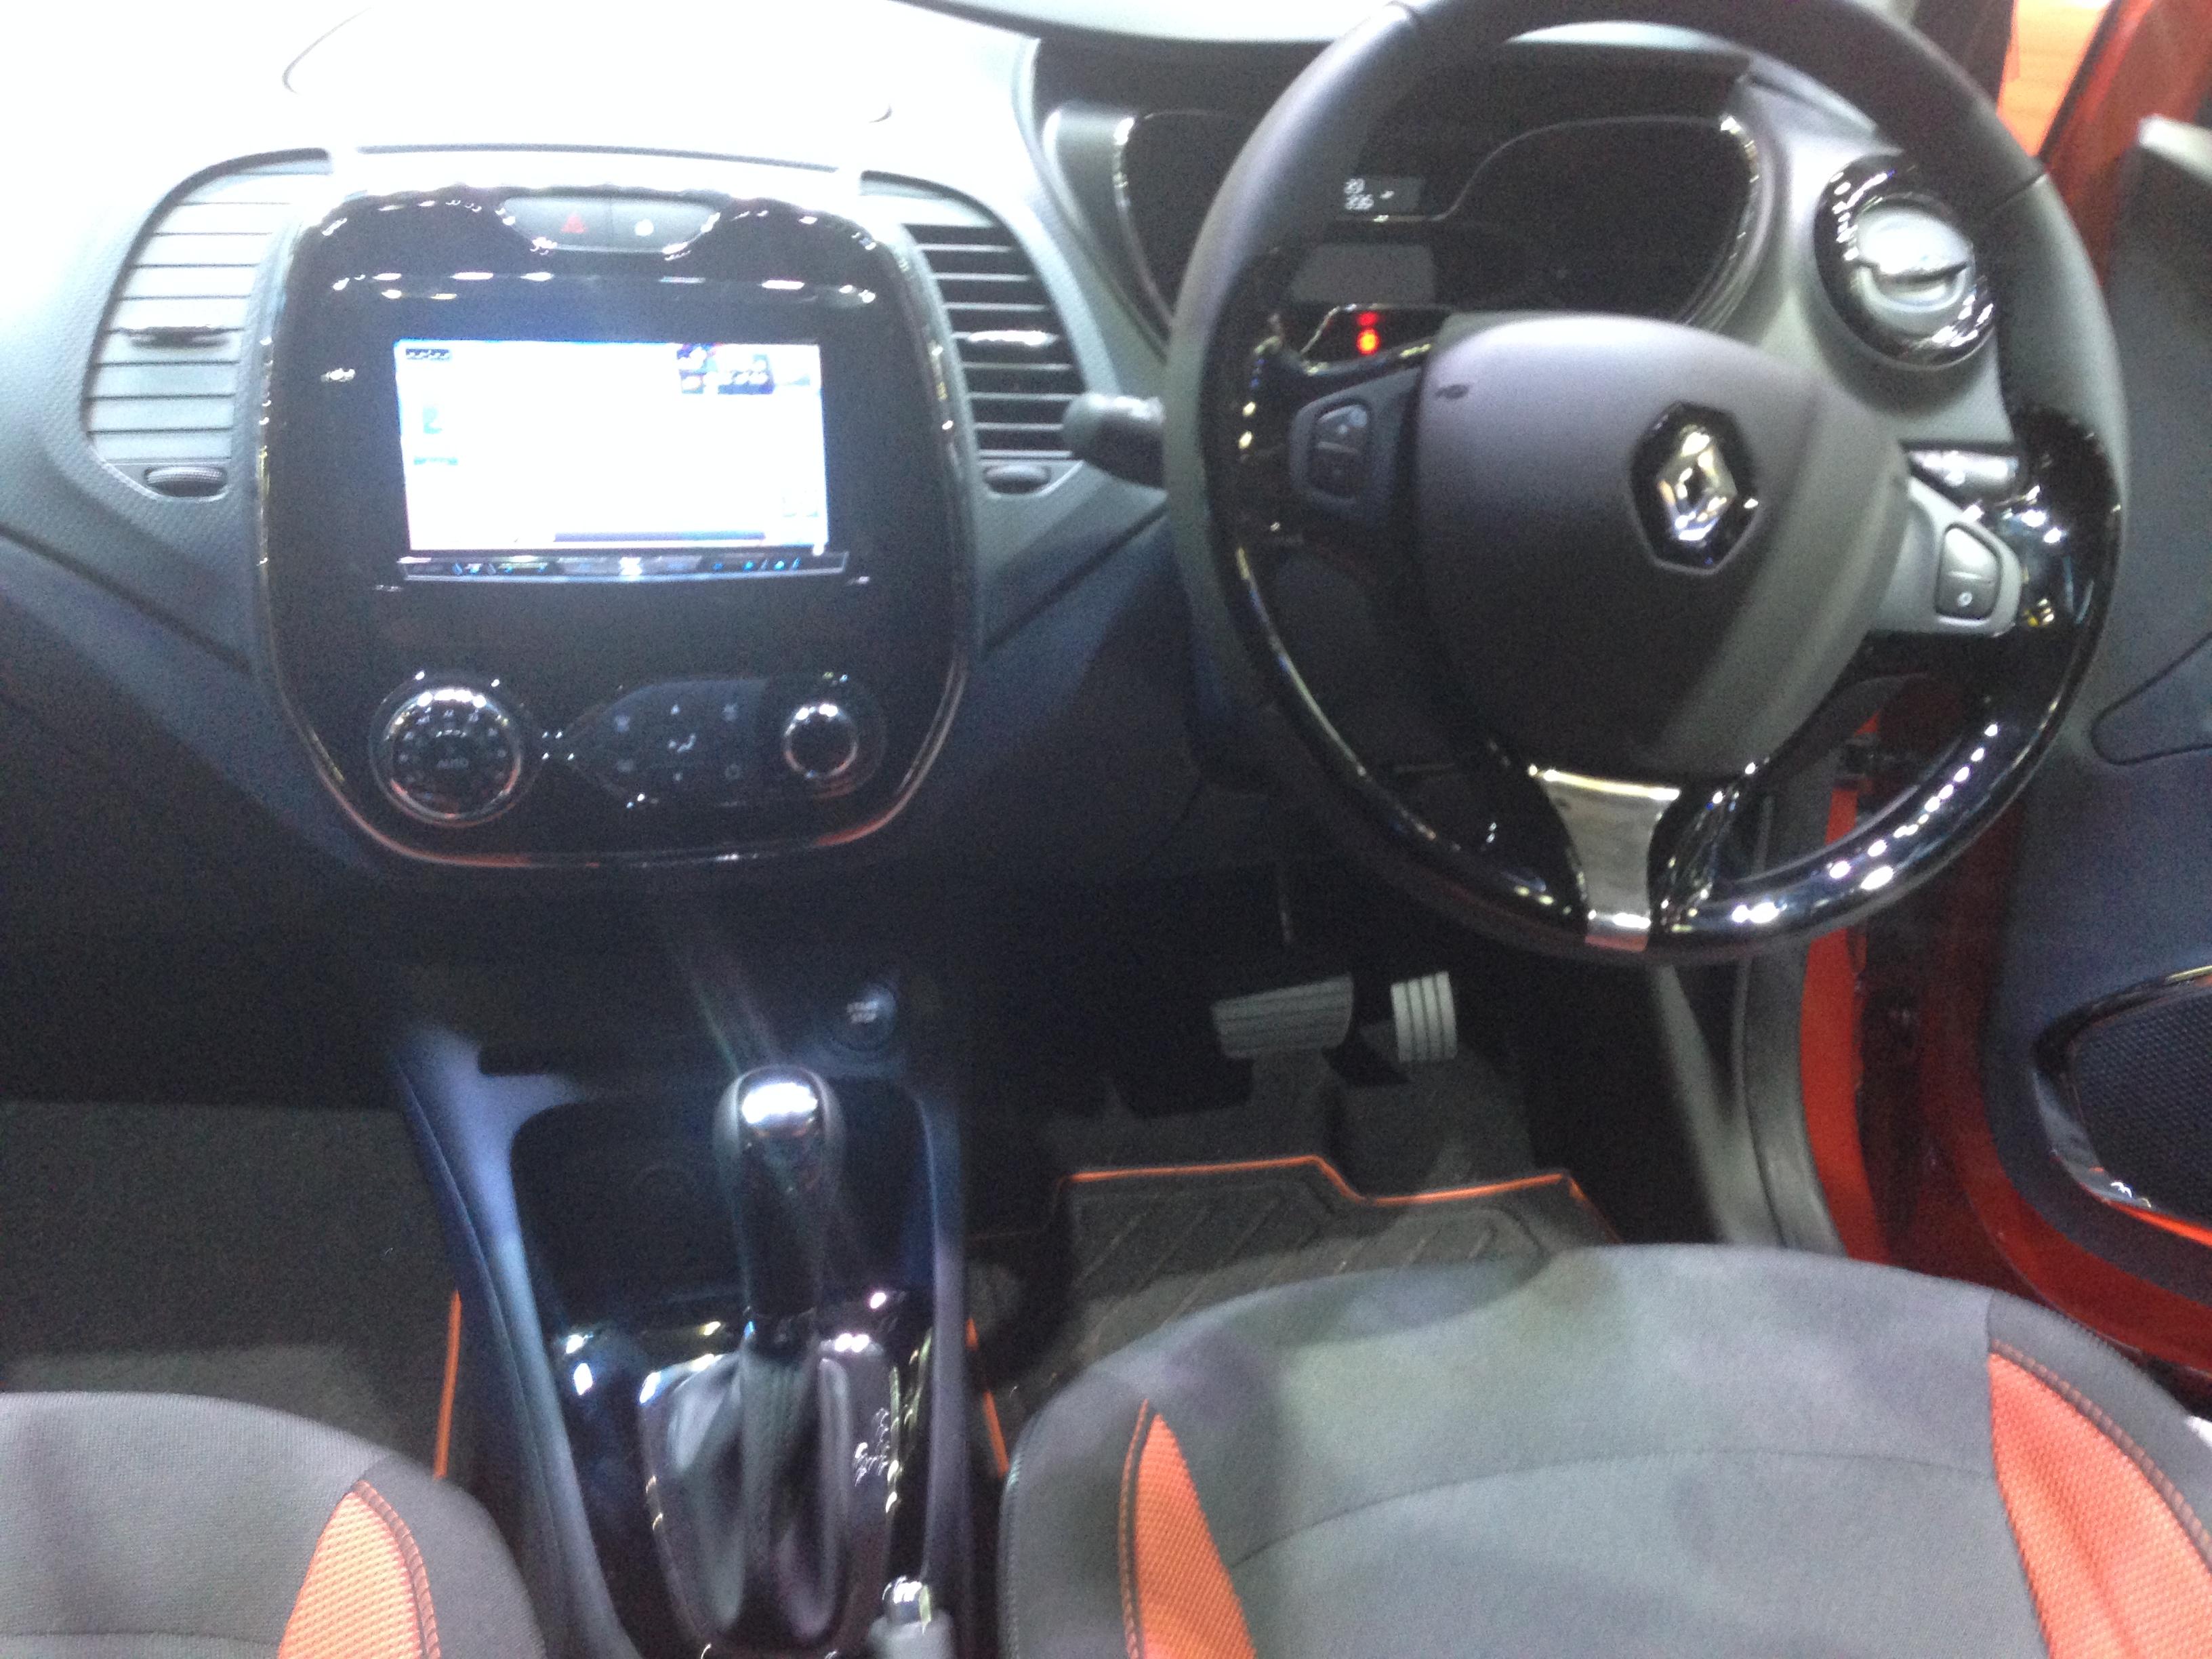 File:Renault Captur interior - Tokyo Motor Show 2013.jpg - Wikimedia ...